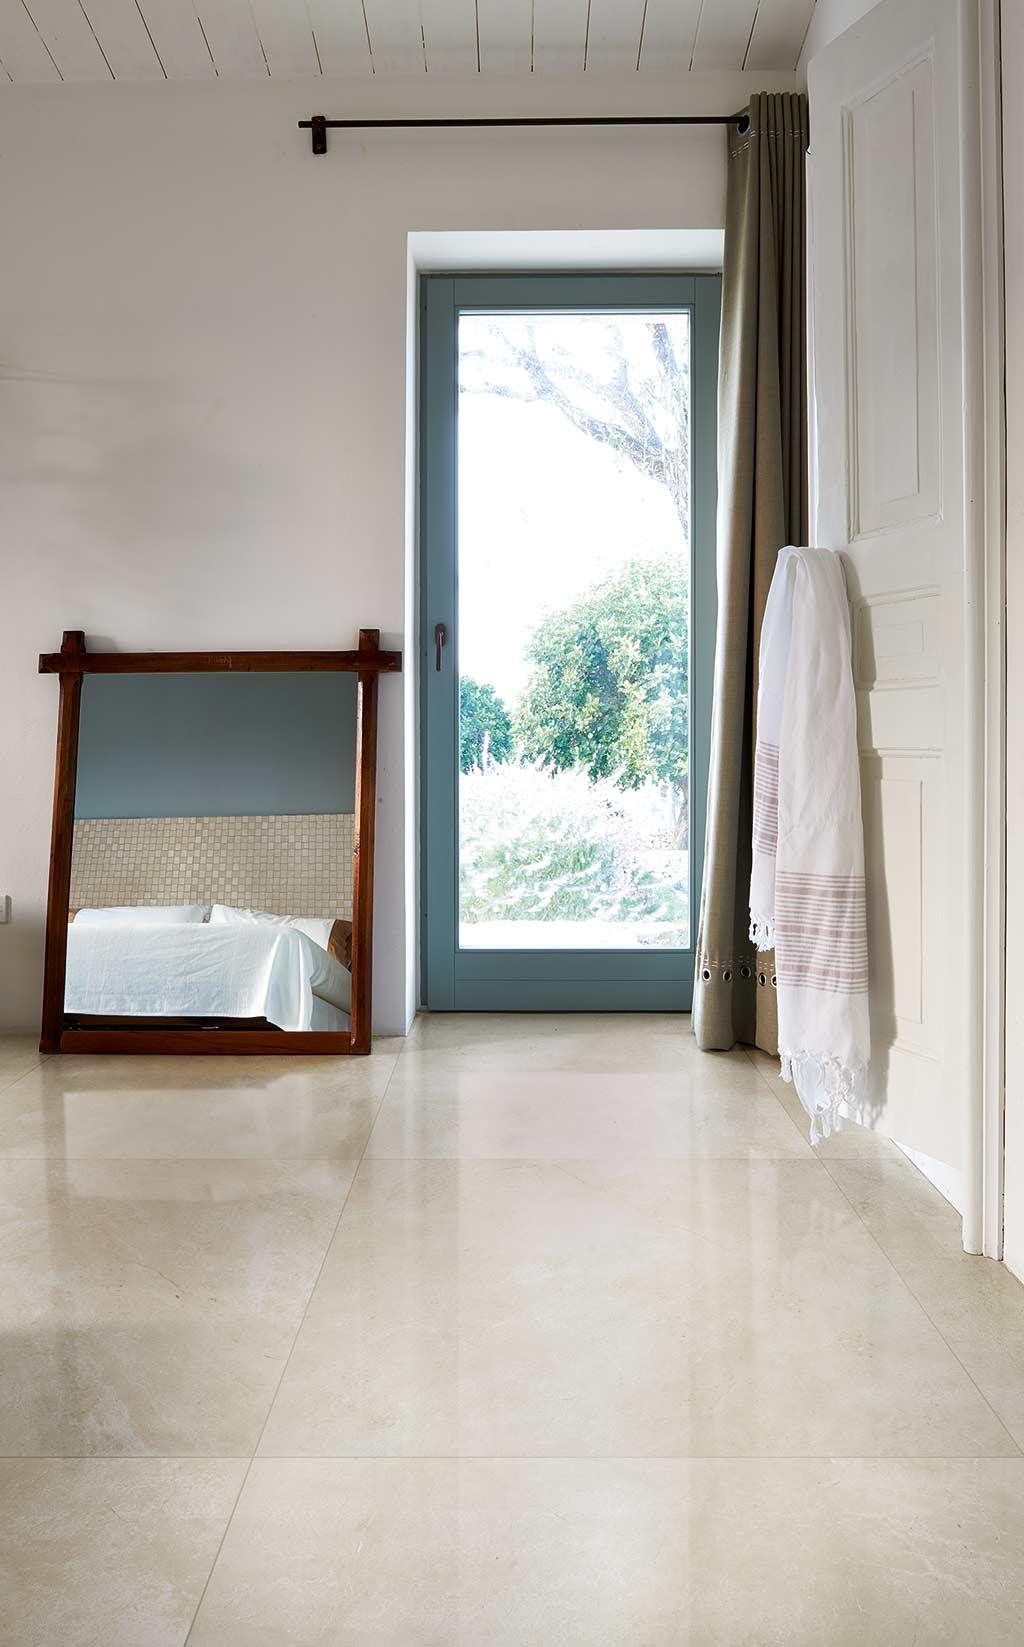 Casa-dolce-casa-stones-&-more-2.0-portfolio-1